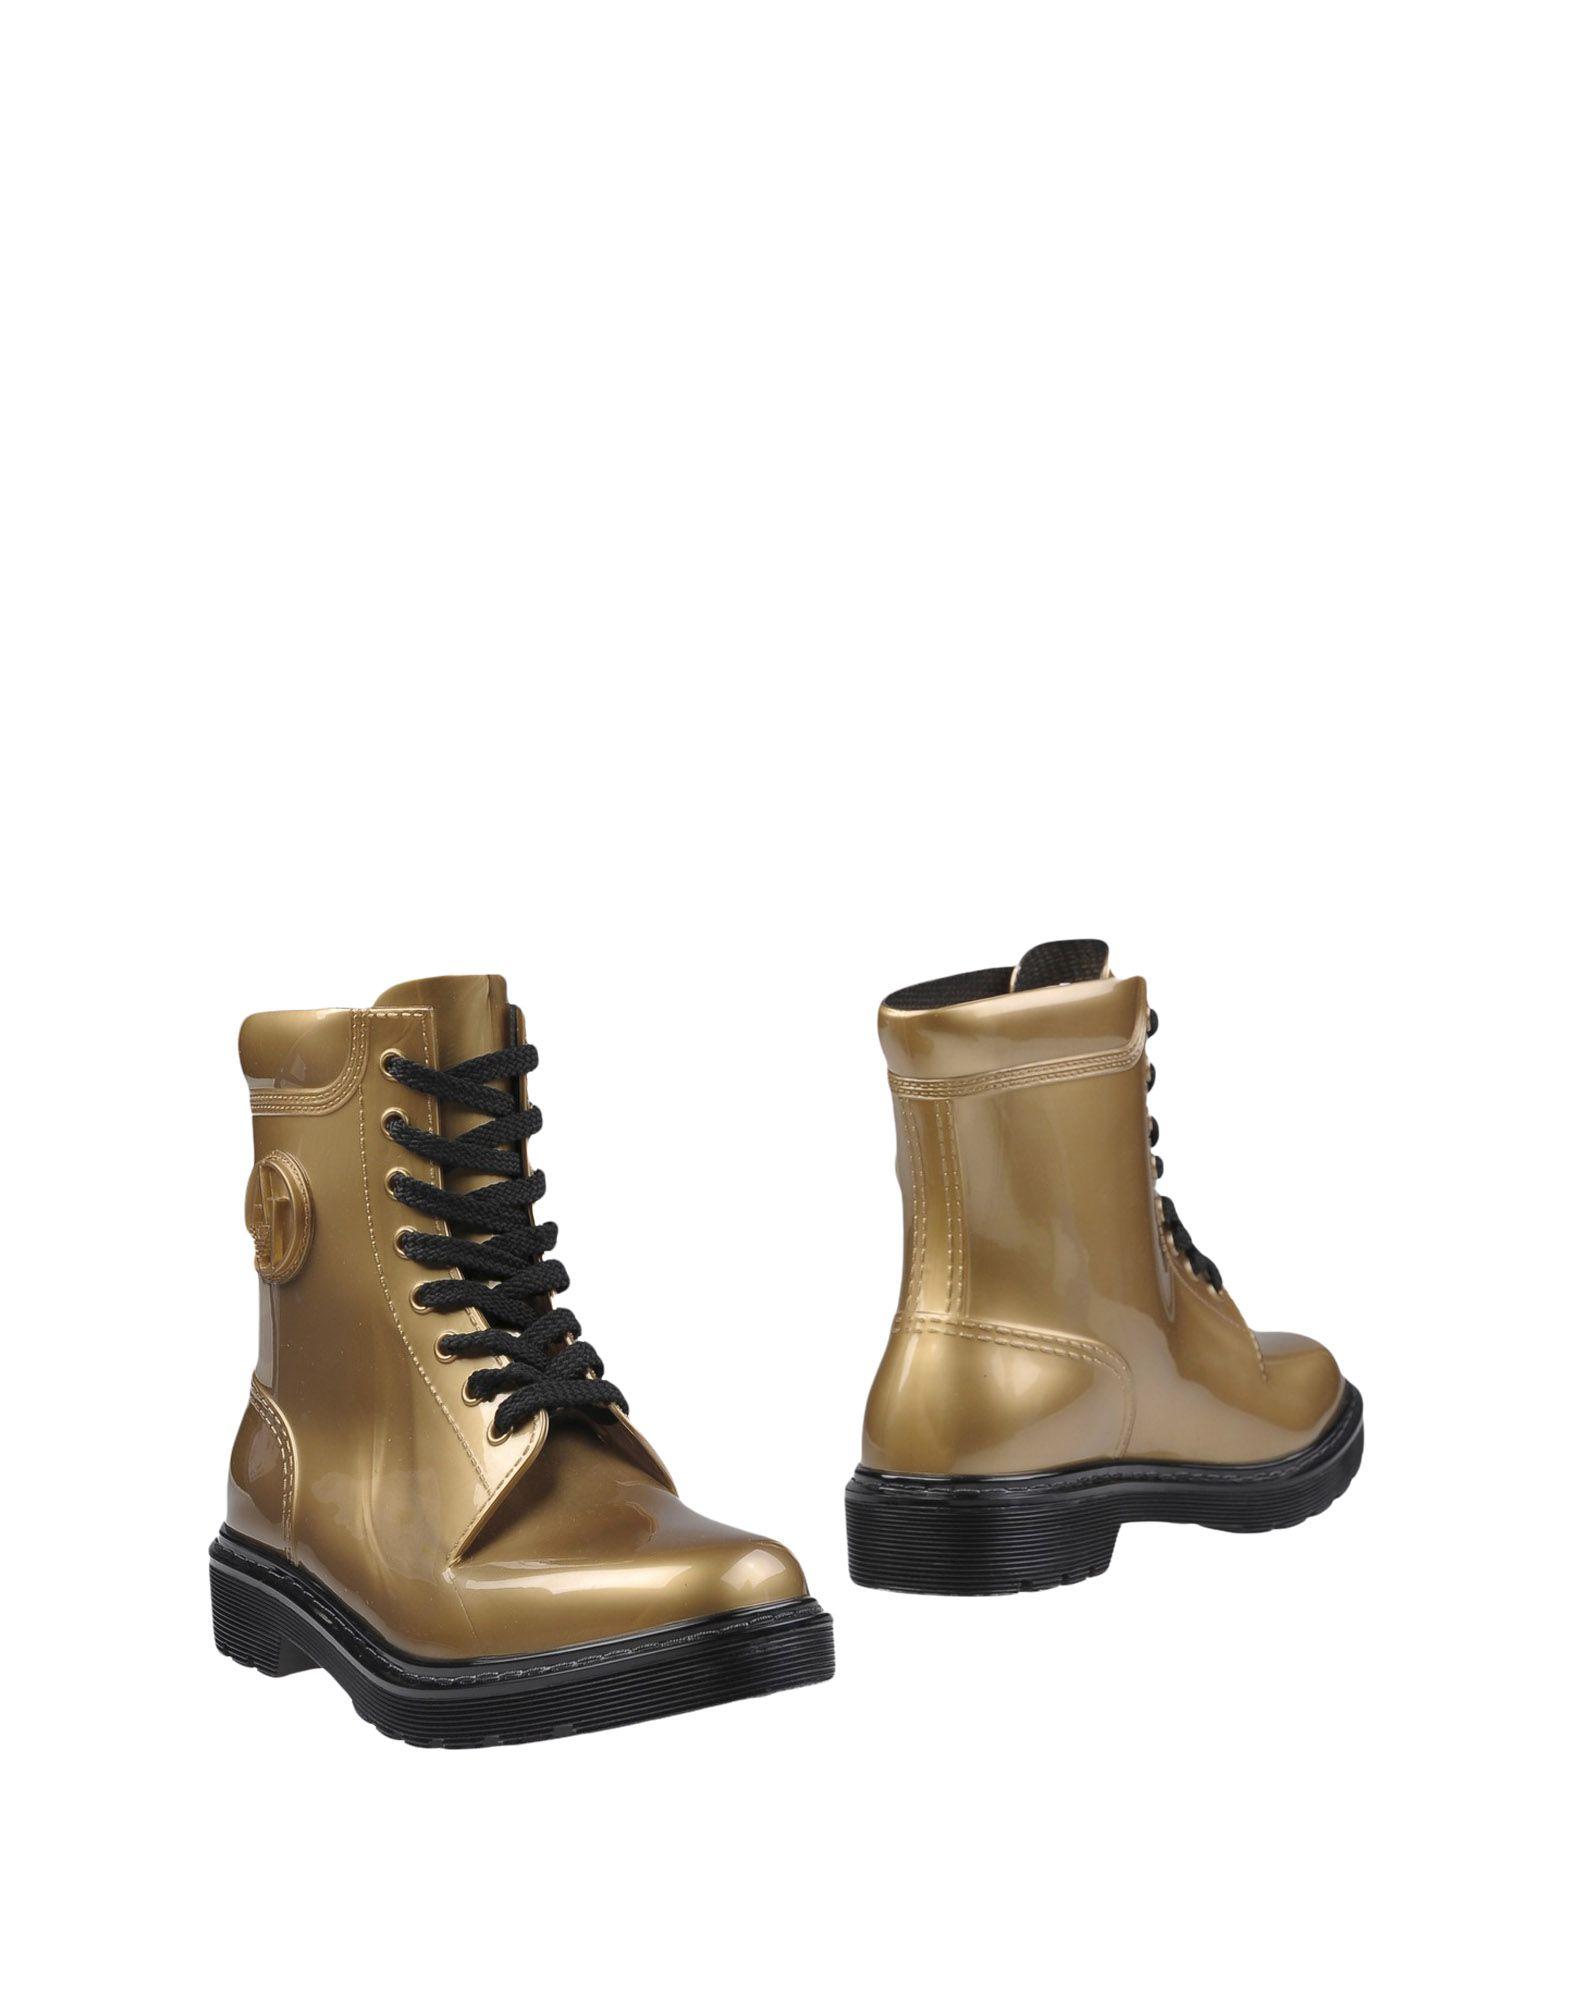 Armani Jeans Gute Stiefelette Damen  11275760LO Gute Jeans Qualität beliebte Schuhe 316143